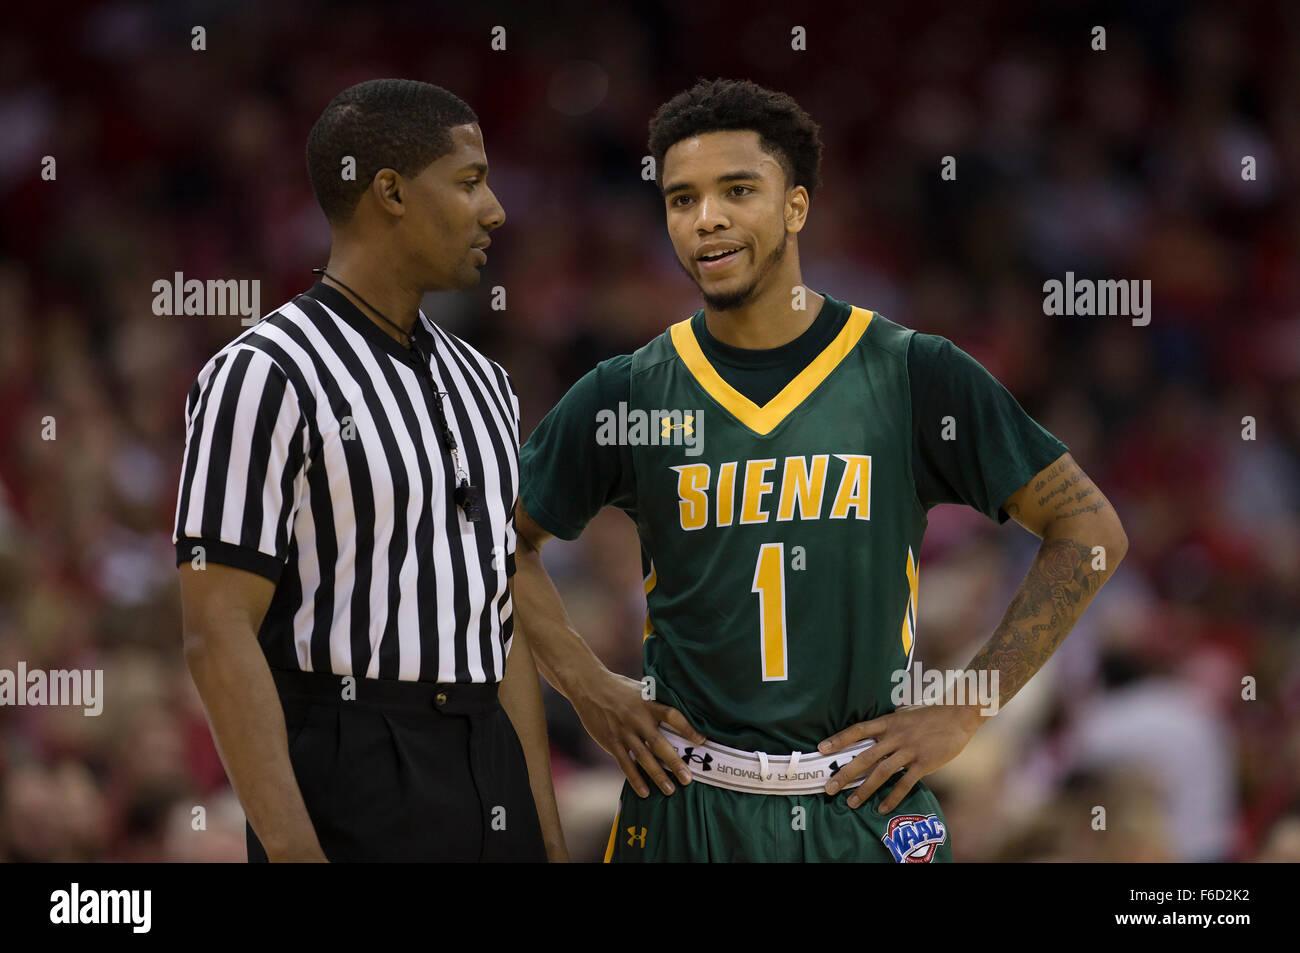 buy online a6239 80e15 Madison, WI, USA. 15th Nov, 2015. Siena Saints guard Marquis ...